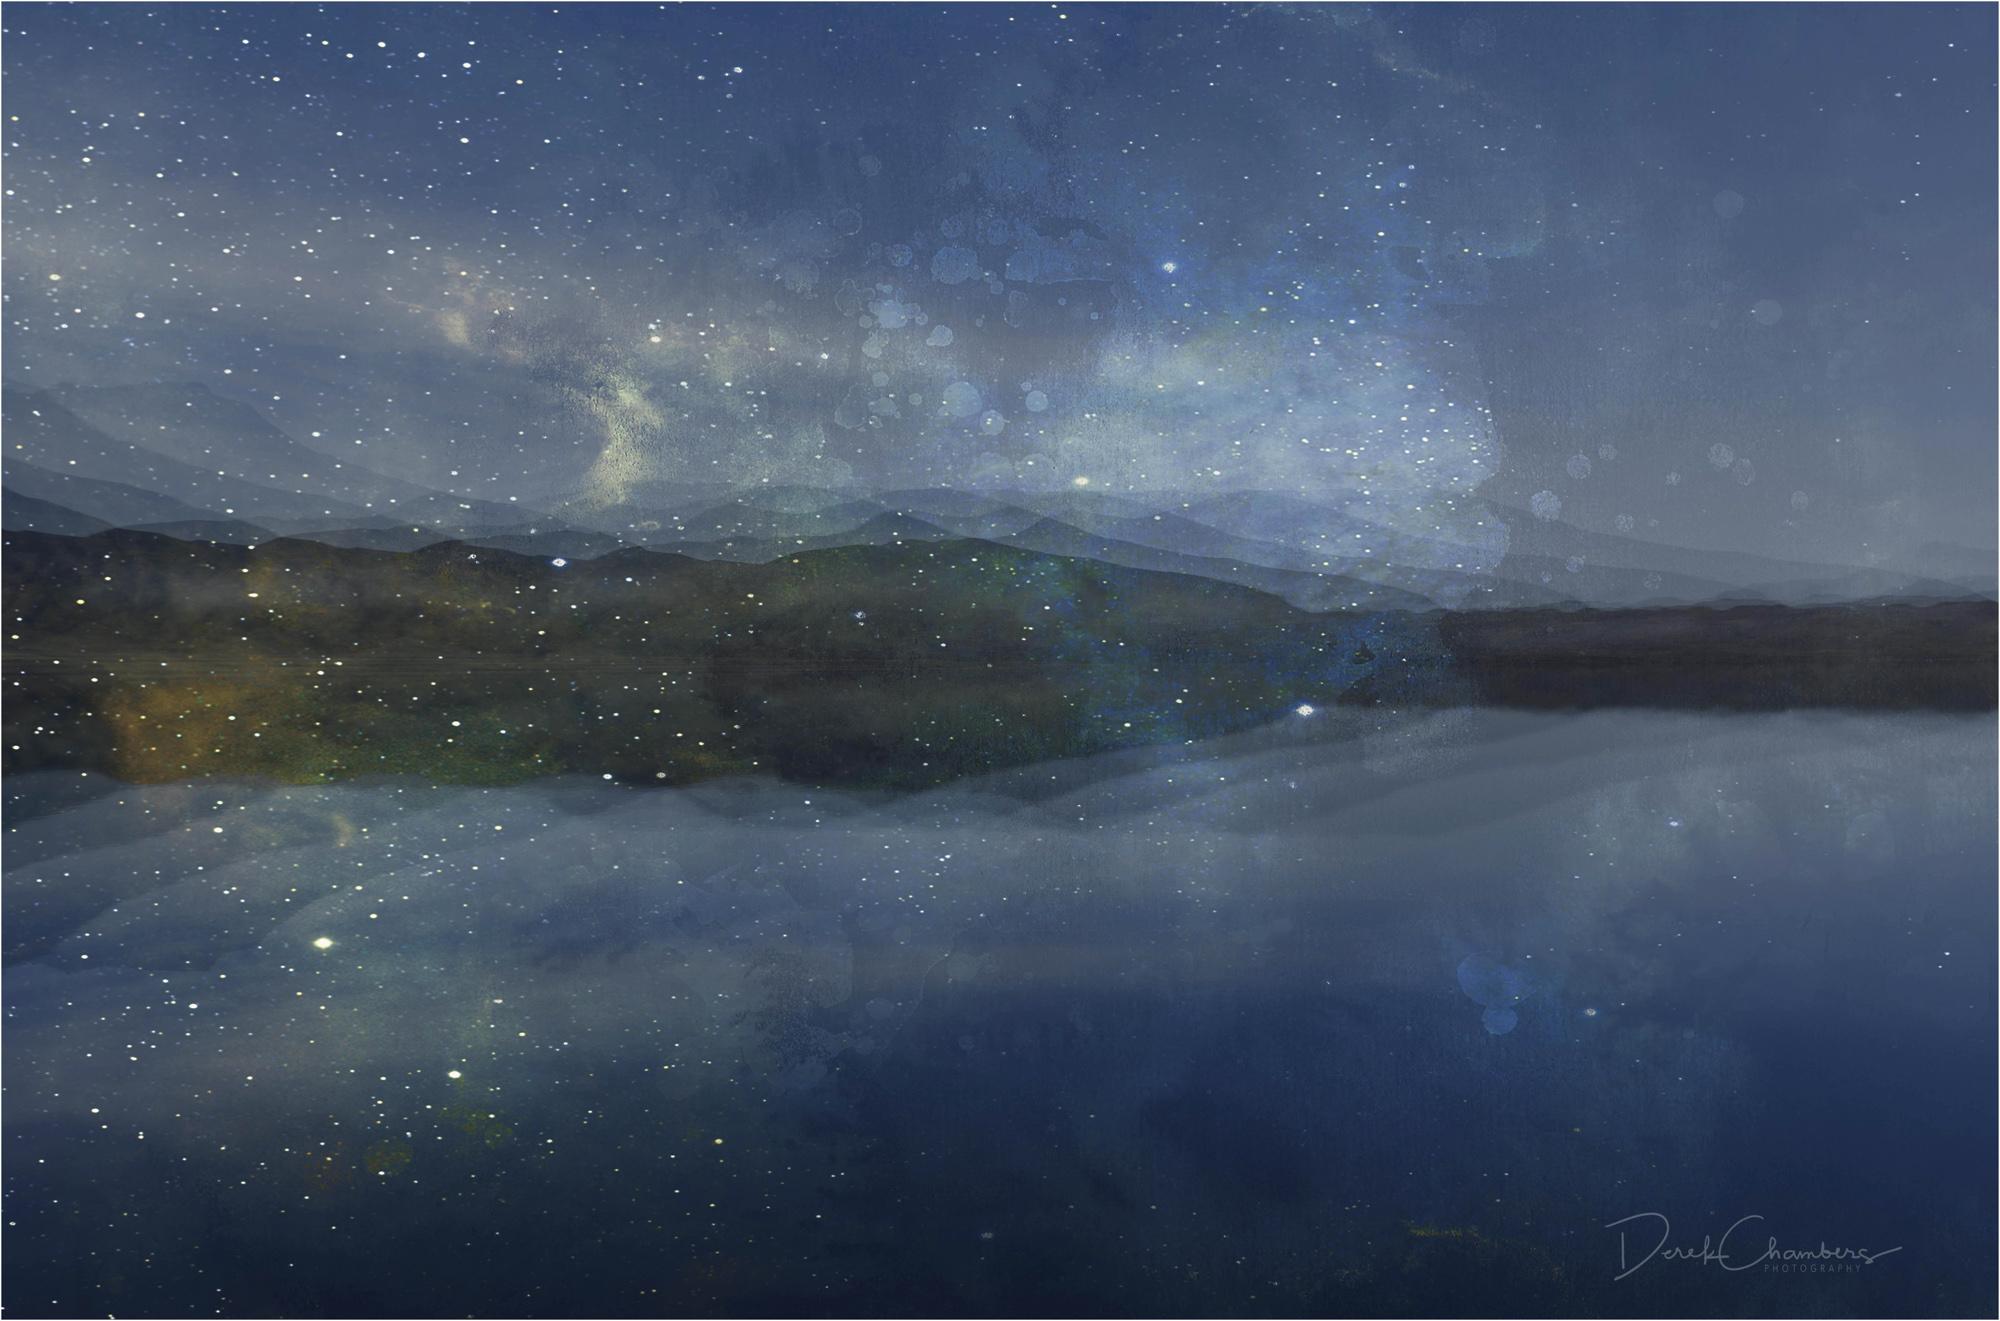 Frostastaðavatn, Iceland Abstract - Derek Chambers